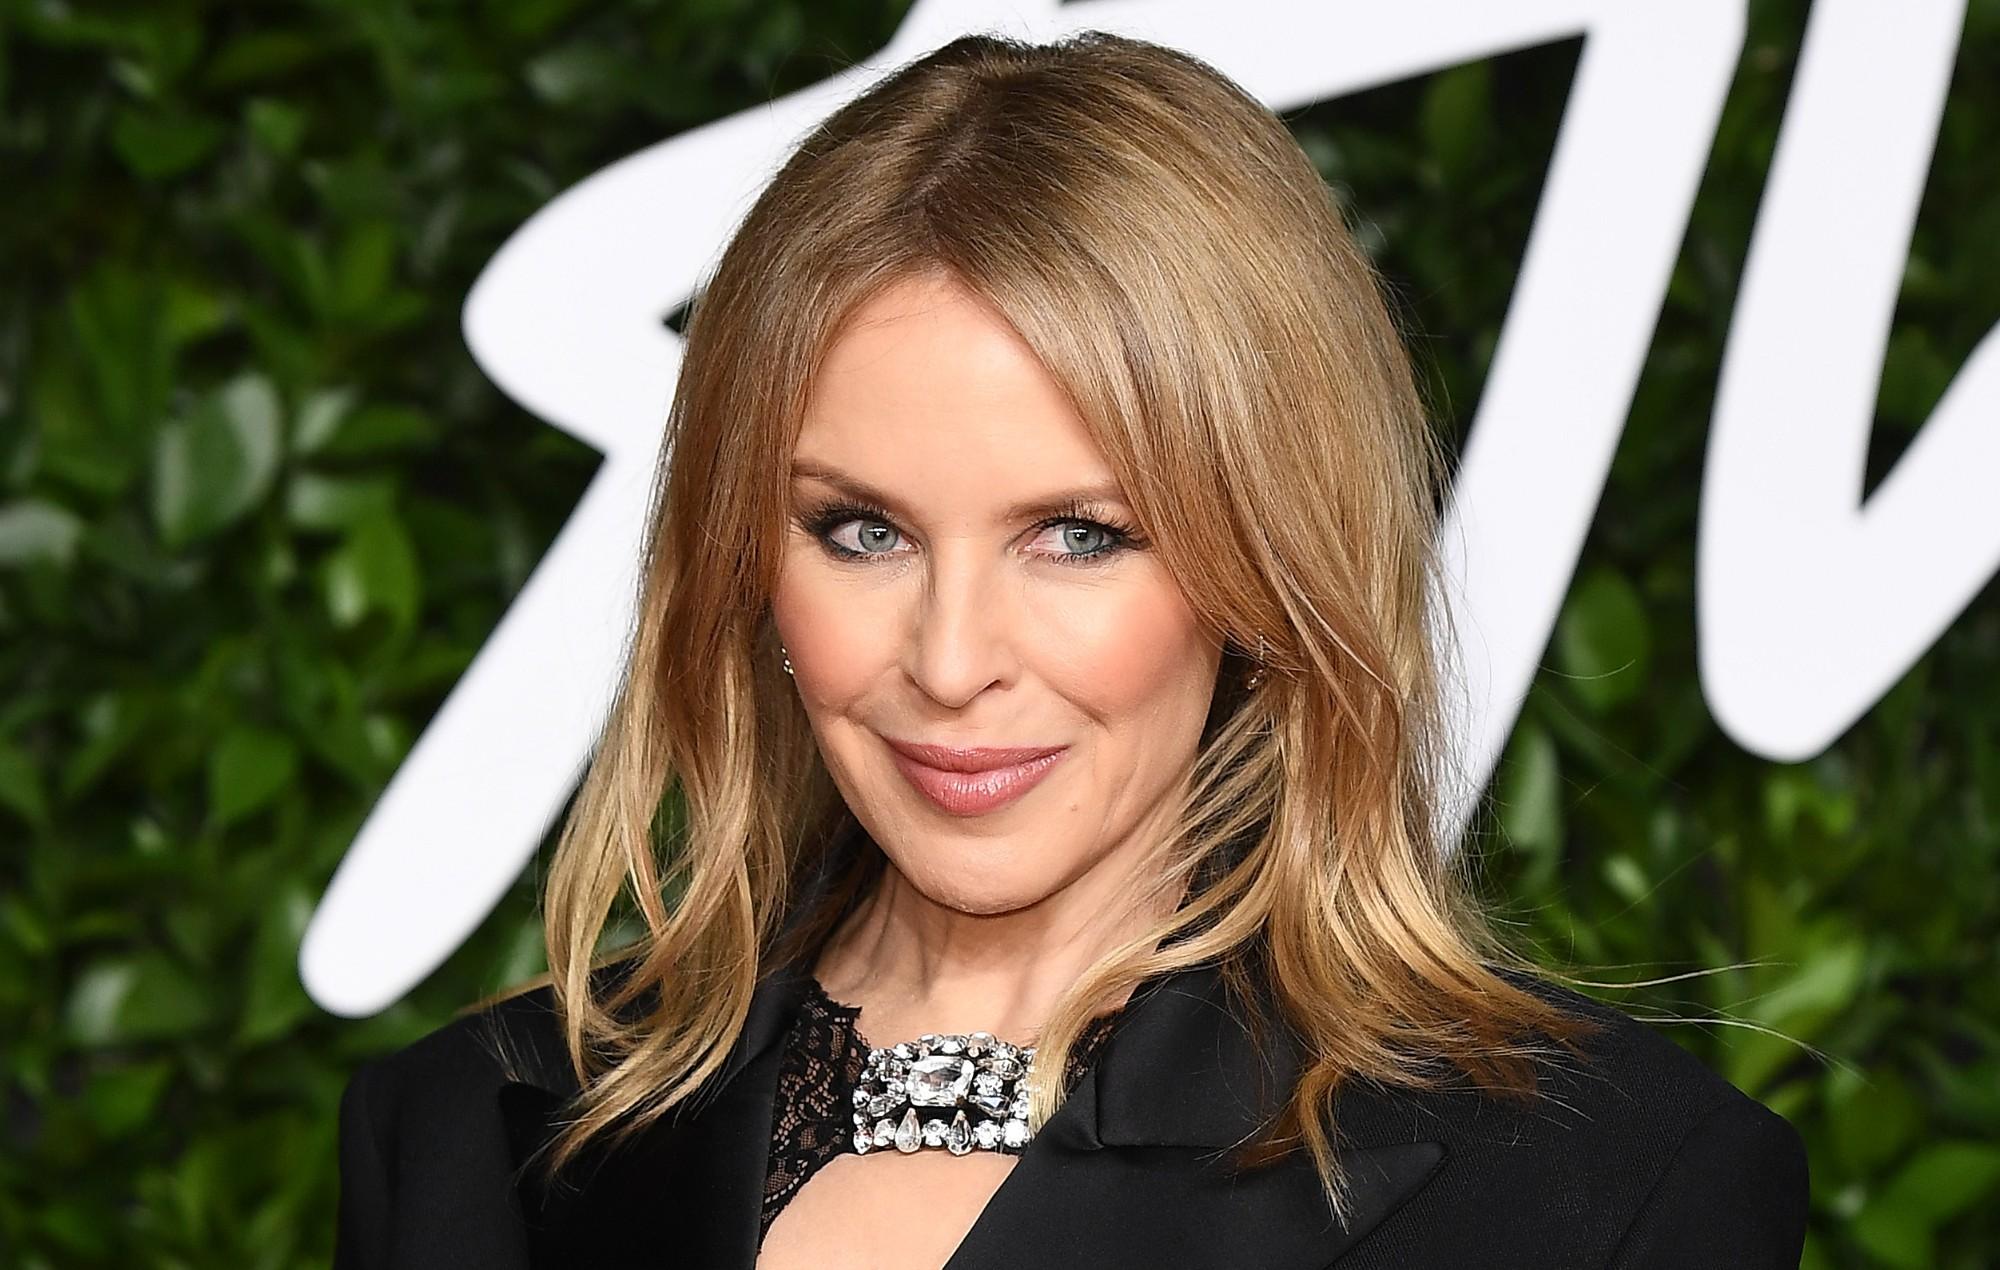 Mohoi fejesën, por Kylie Minogue paska nisur përgatitjet për dasmën